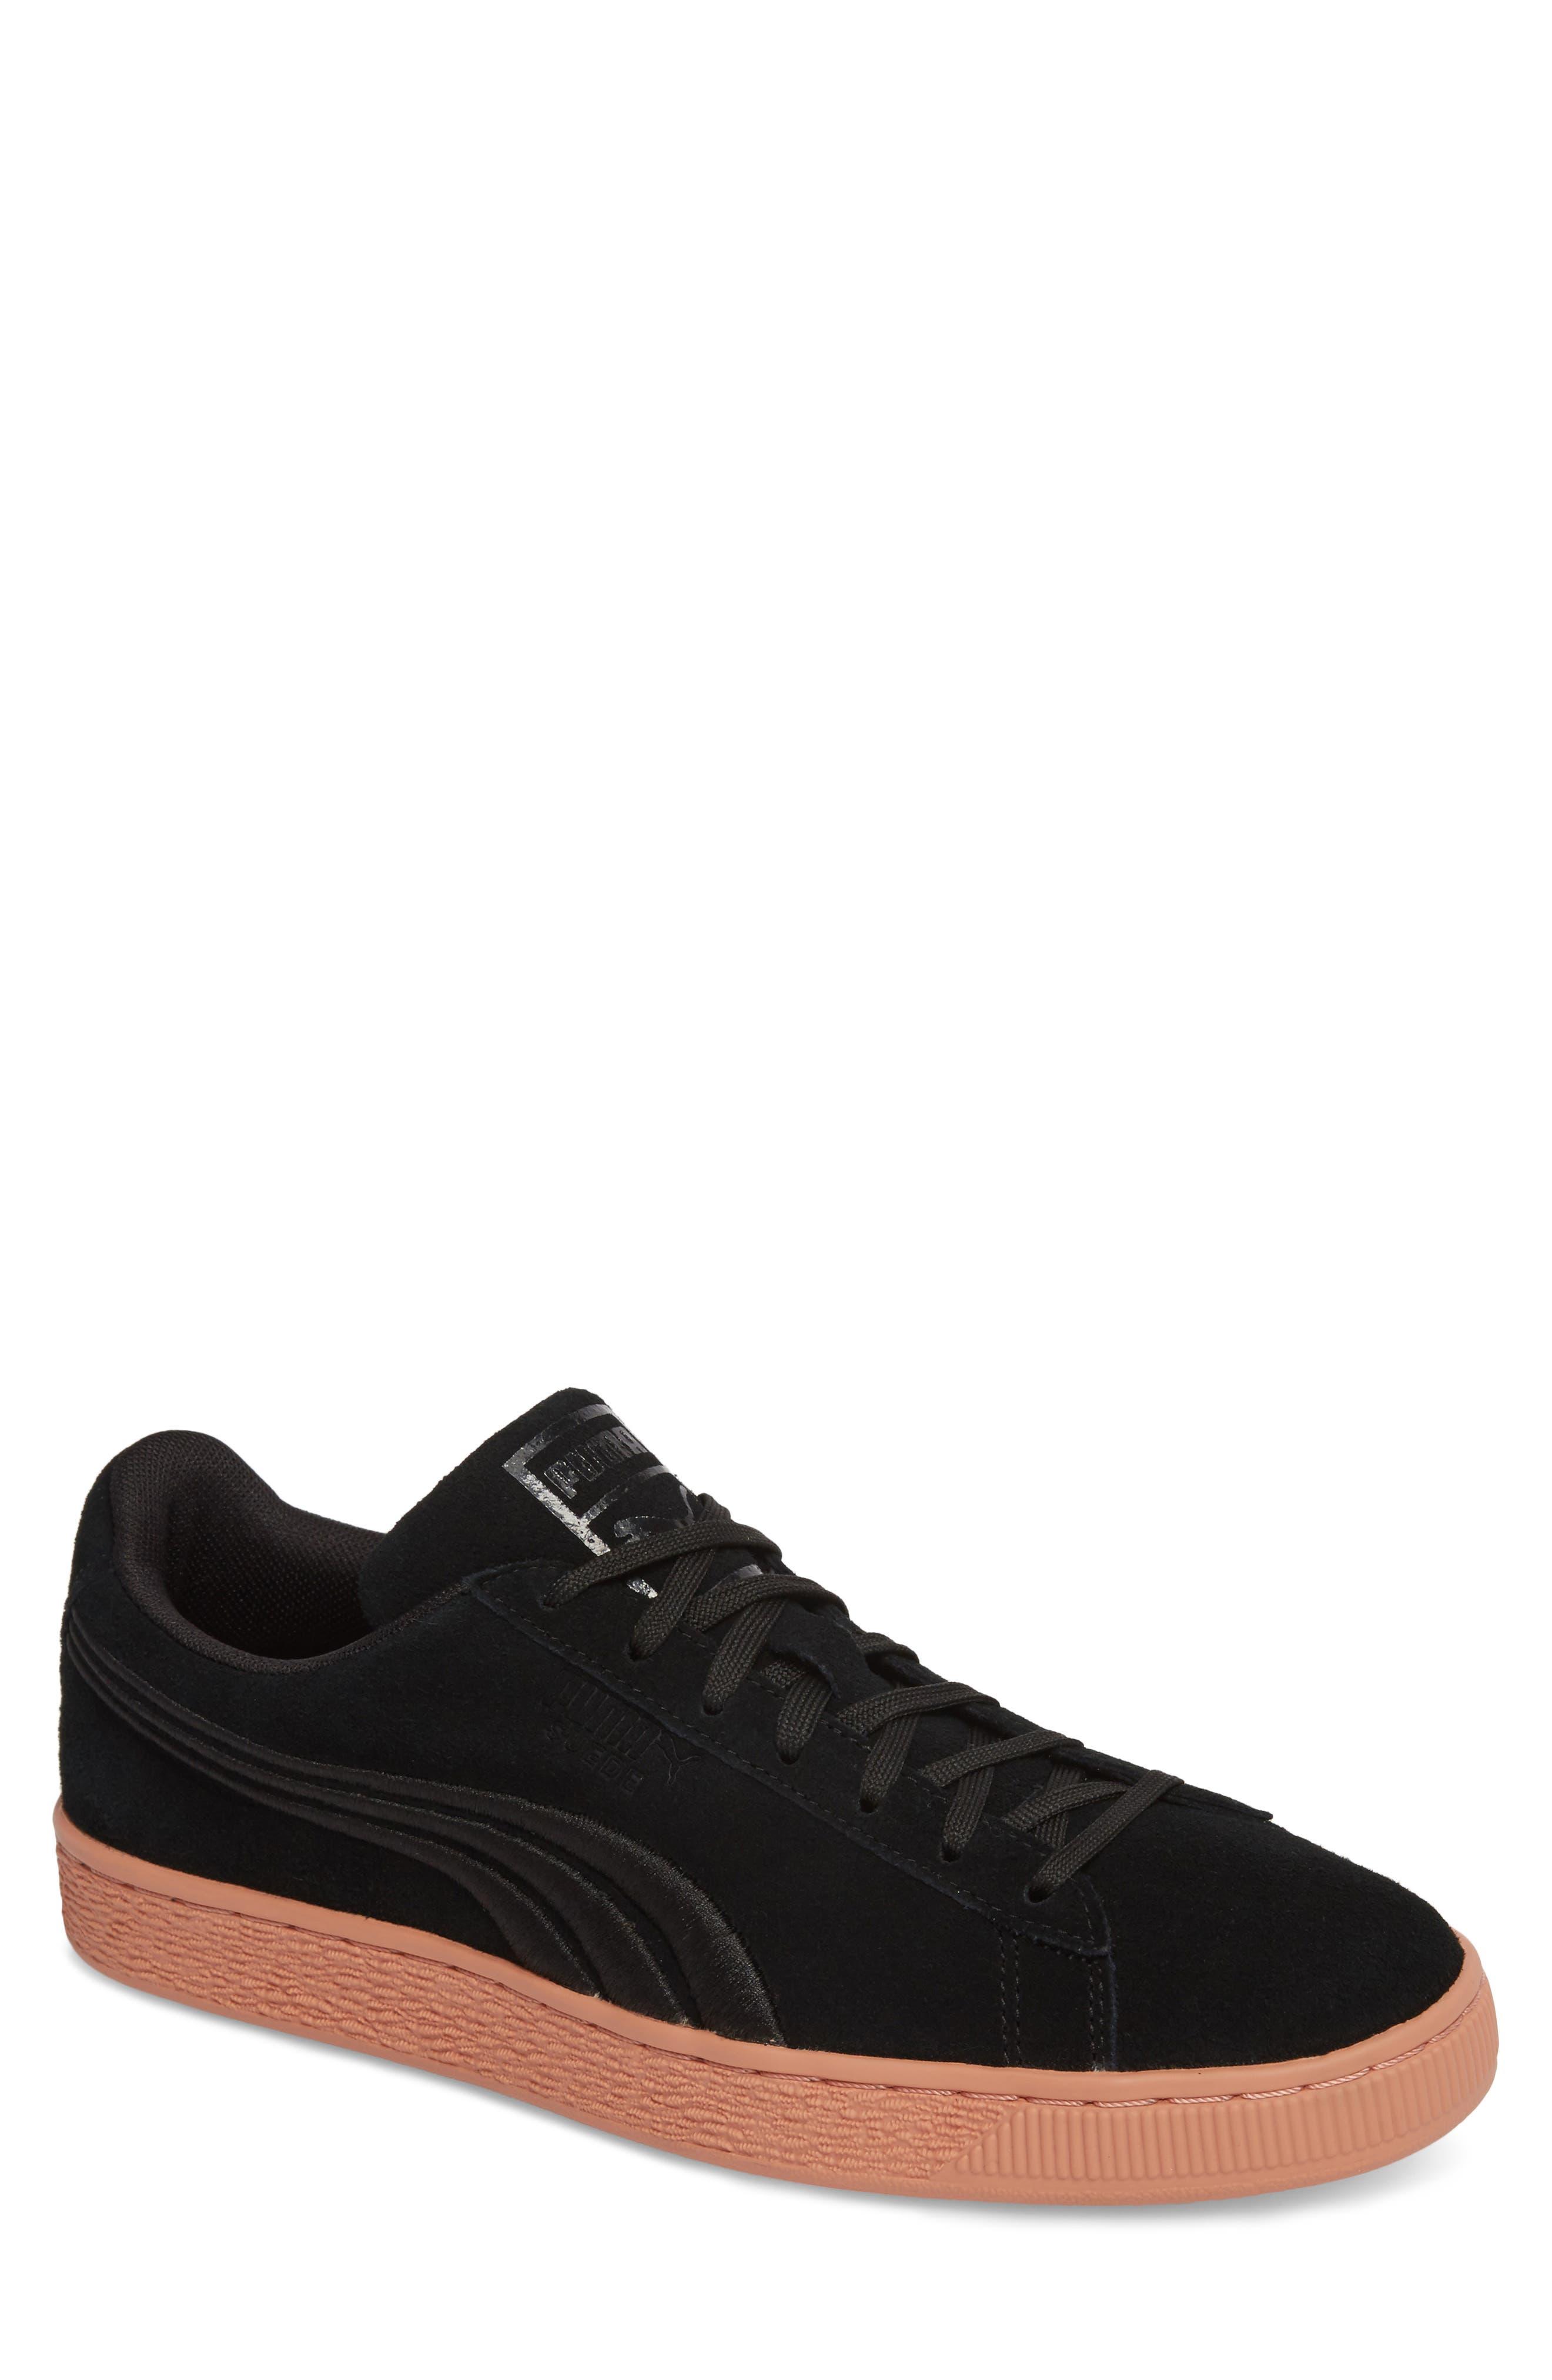 PUMA Suede Classic Bade Sneaker (Men)